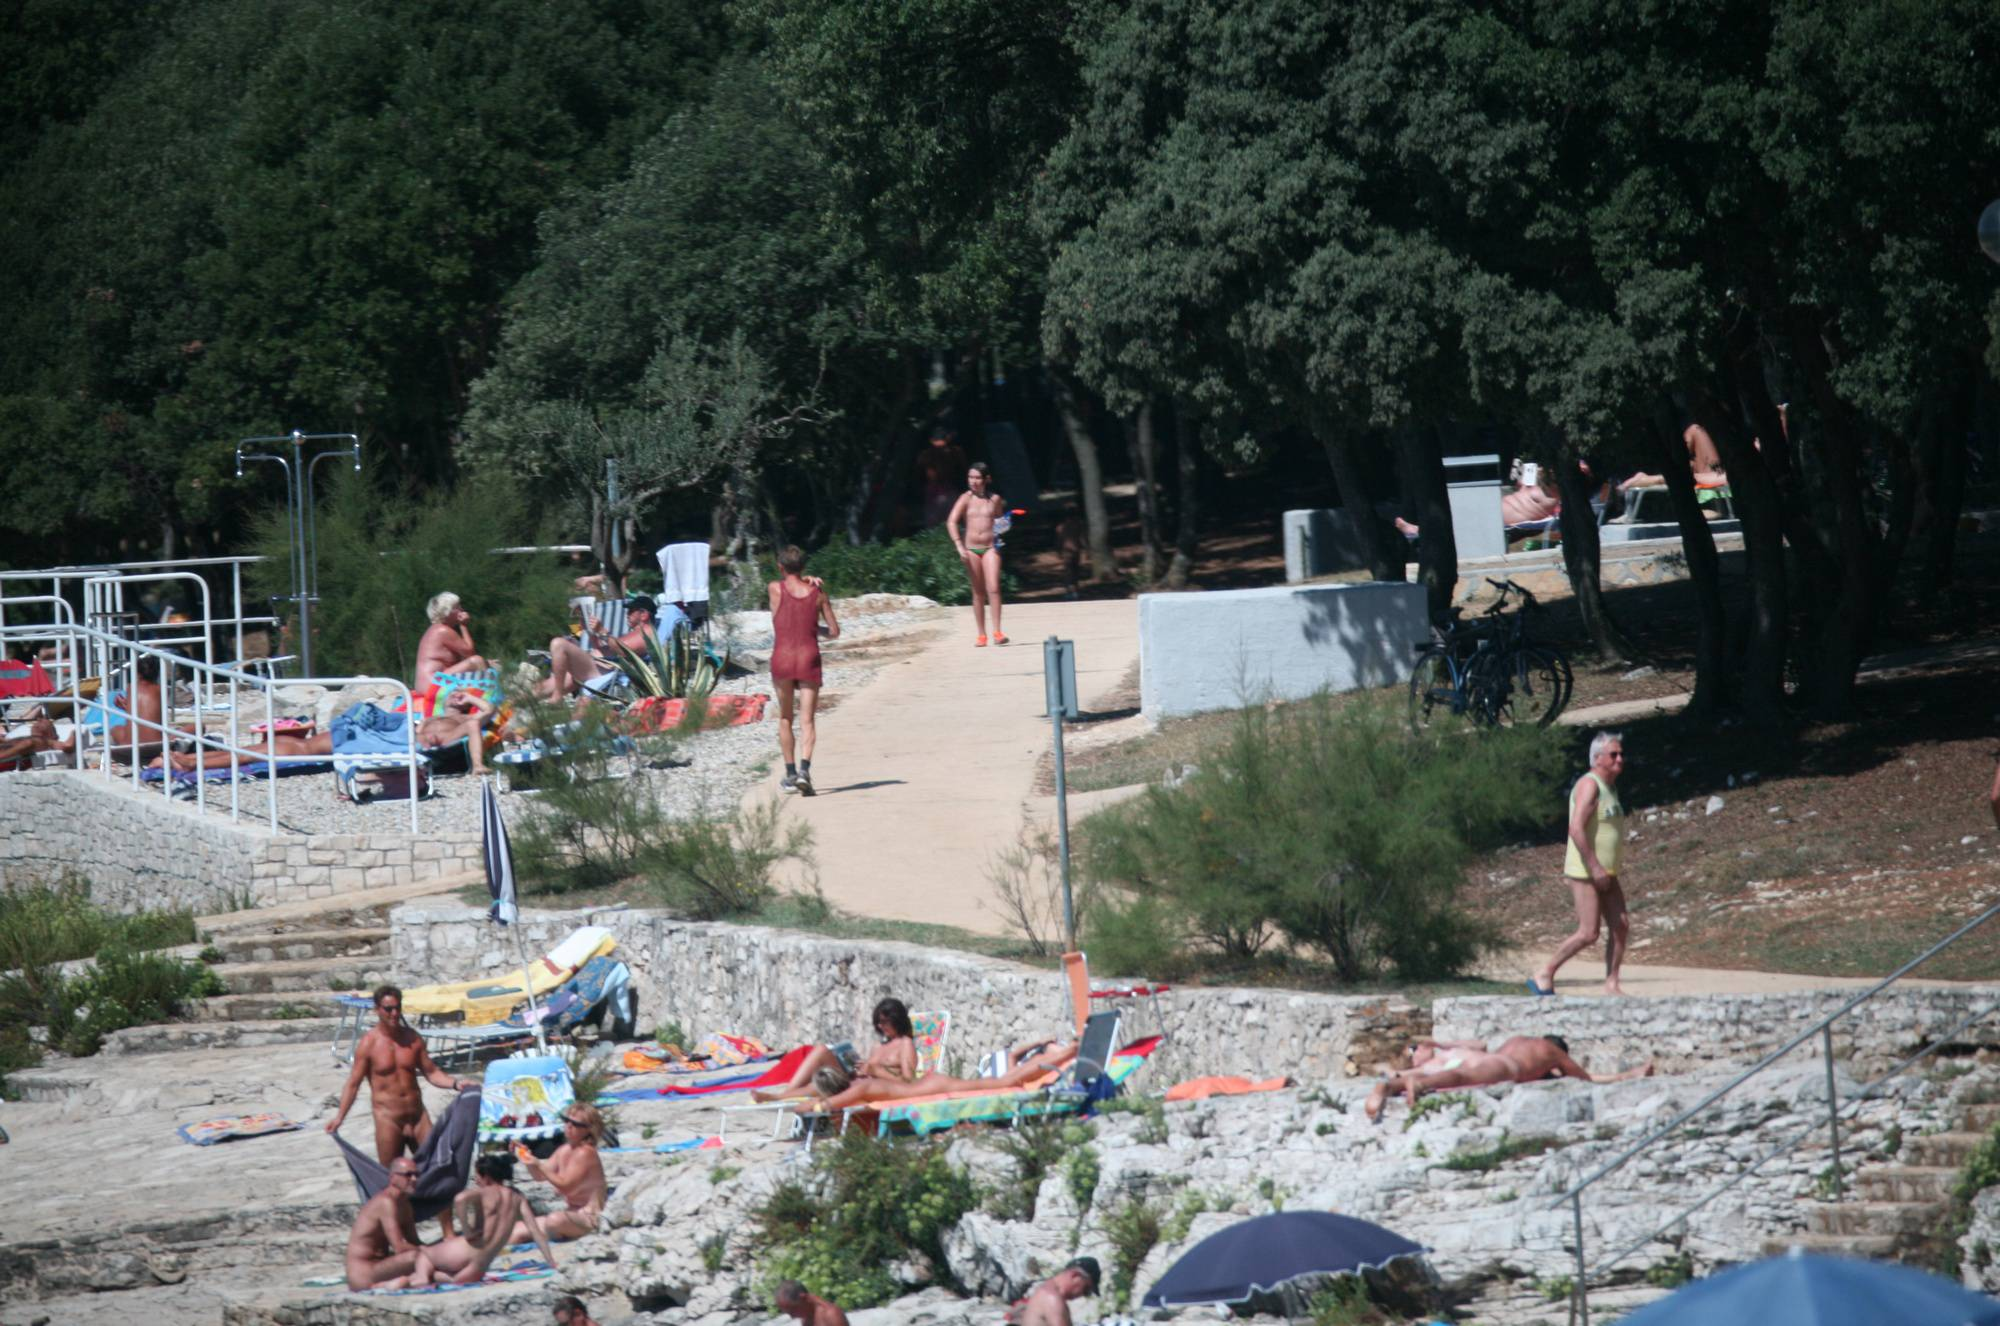 Nudist Pics Far Nudist Beach Look-Out - 2